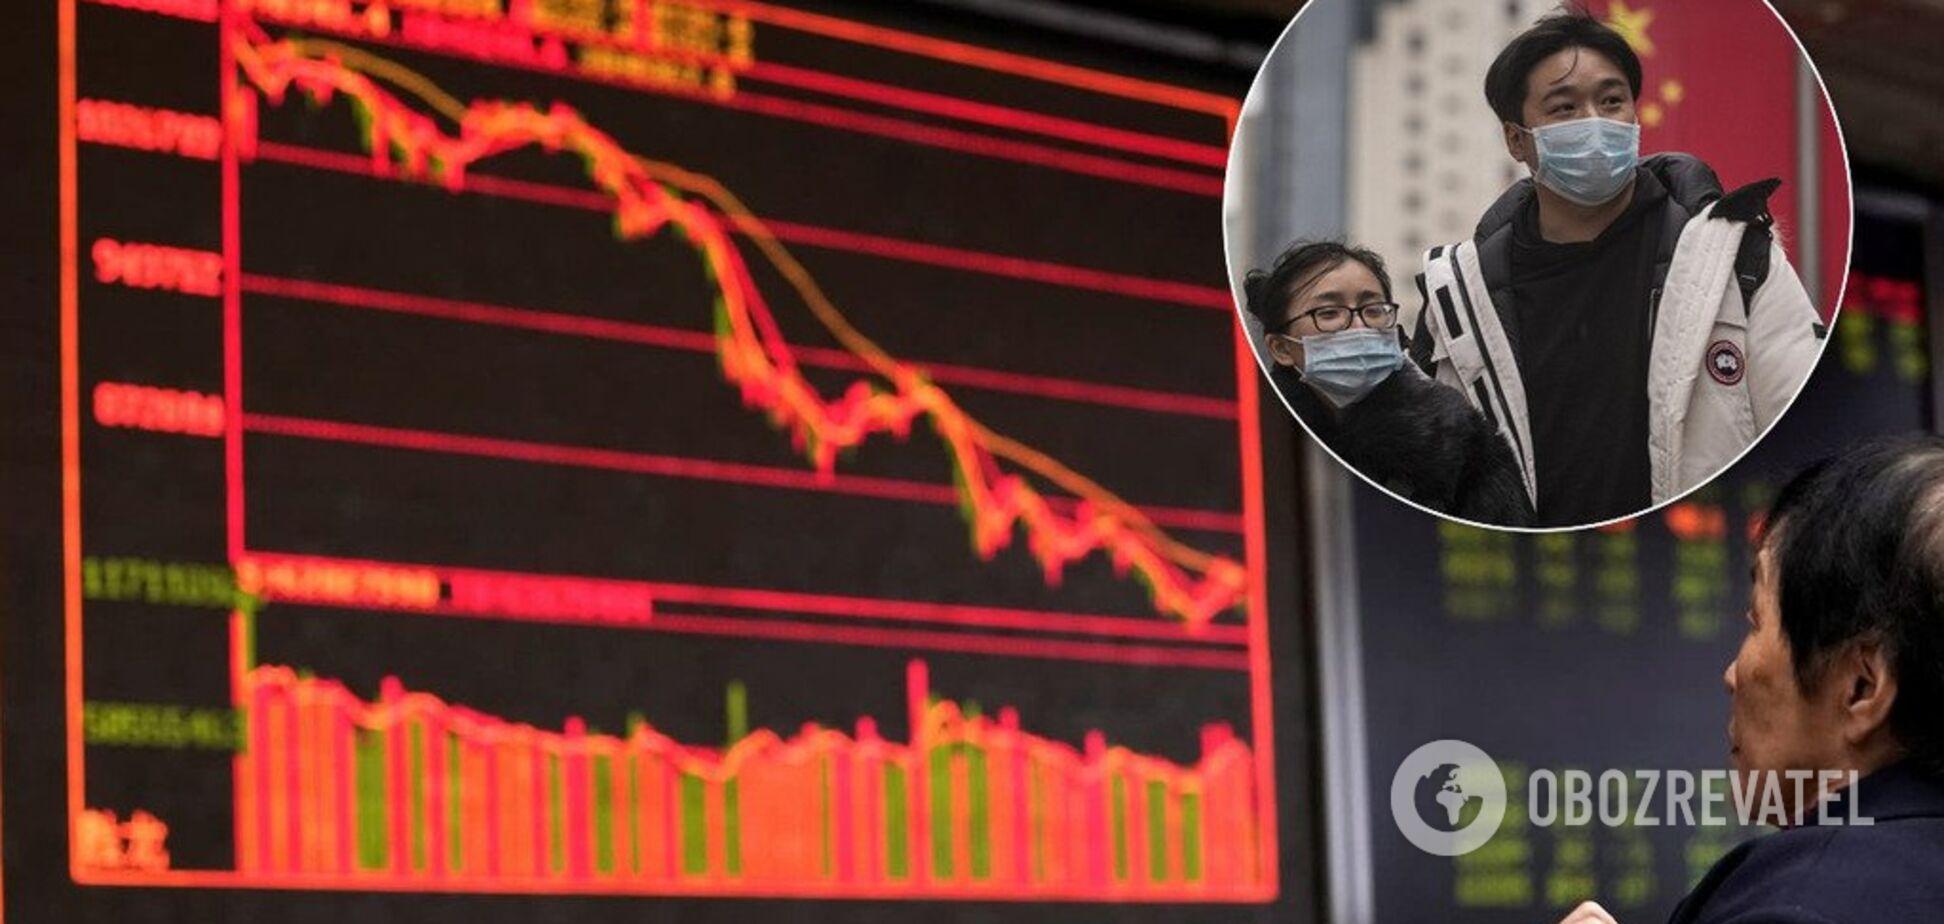 Из-за коронавируса? В Китае рухнули биржи